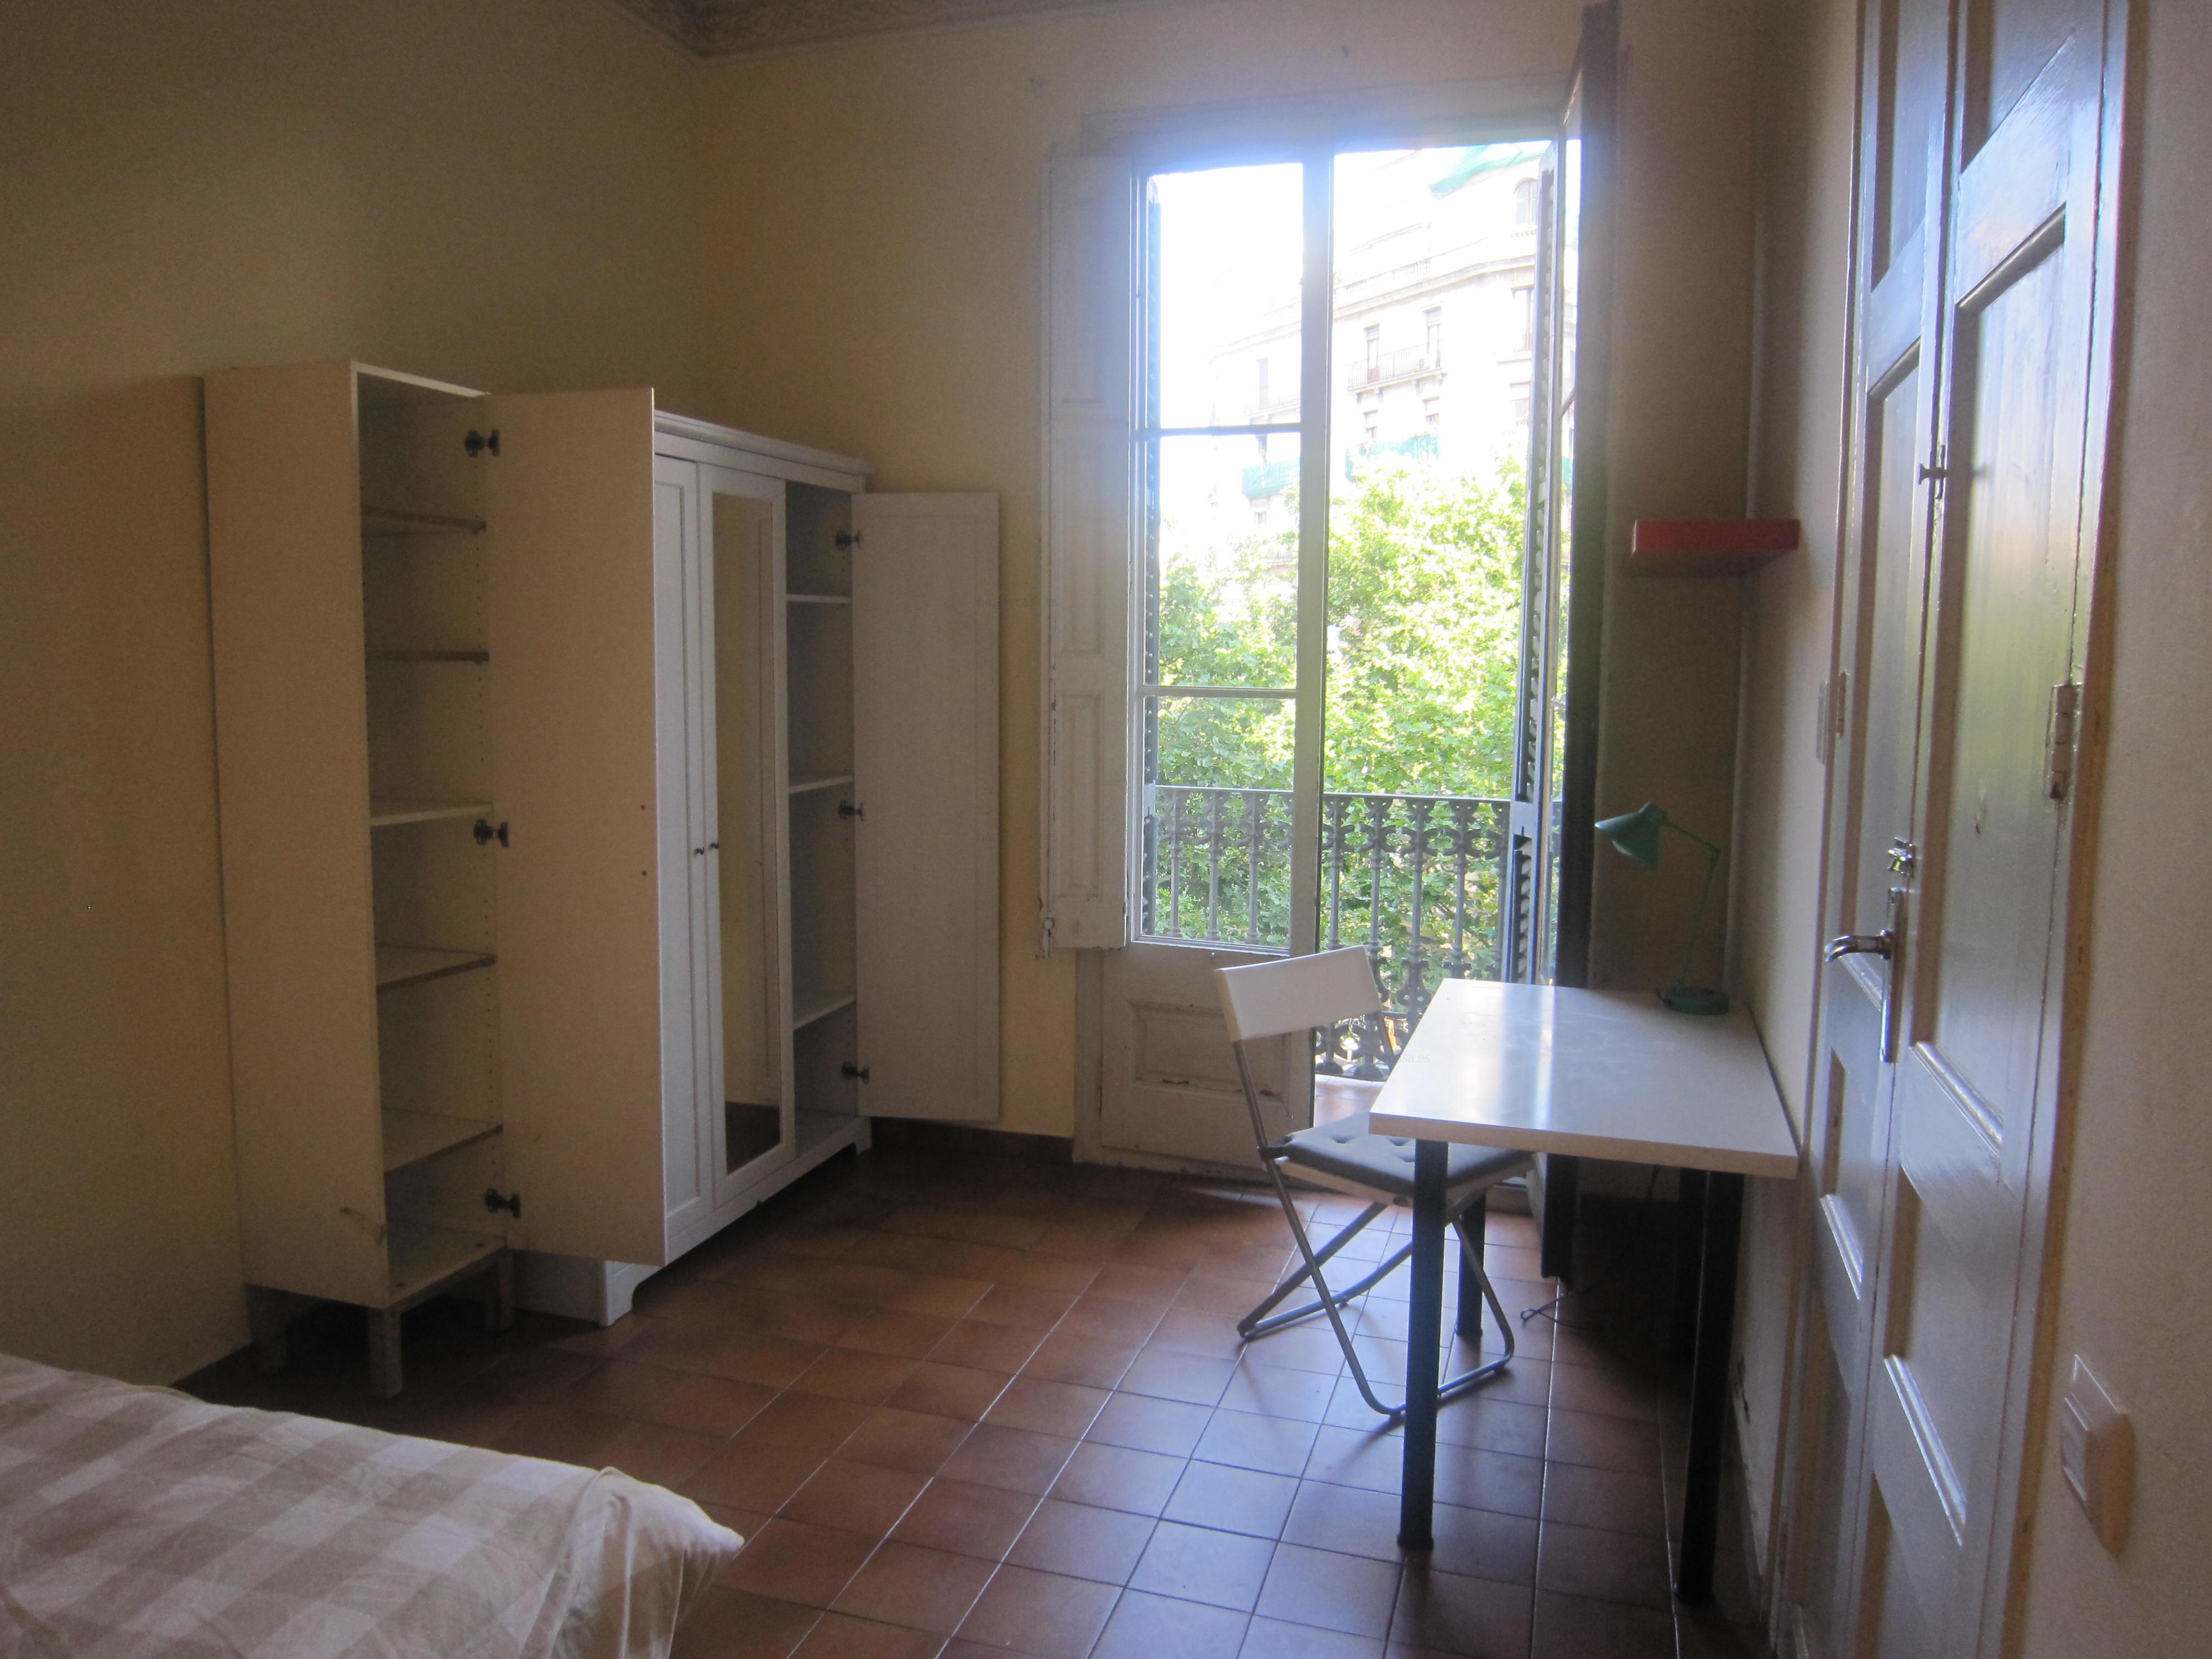 Linda habitación con armario empotrado escritorio Barcelona piso